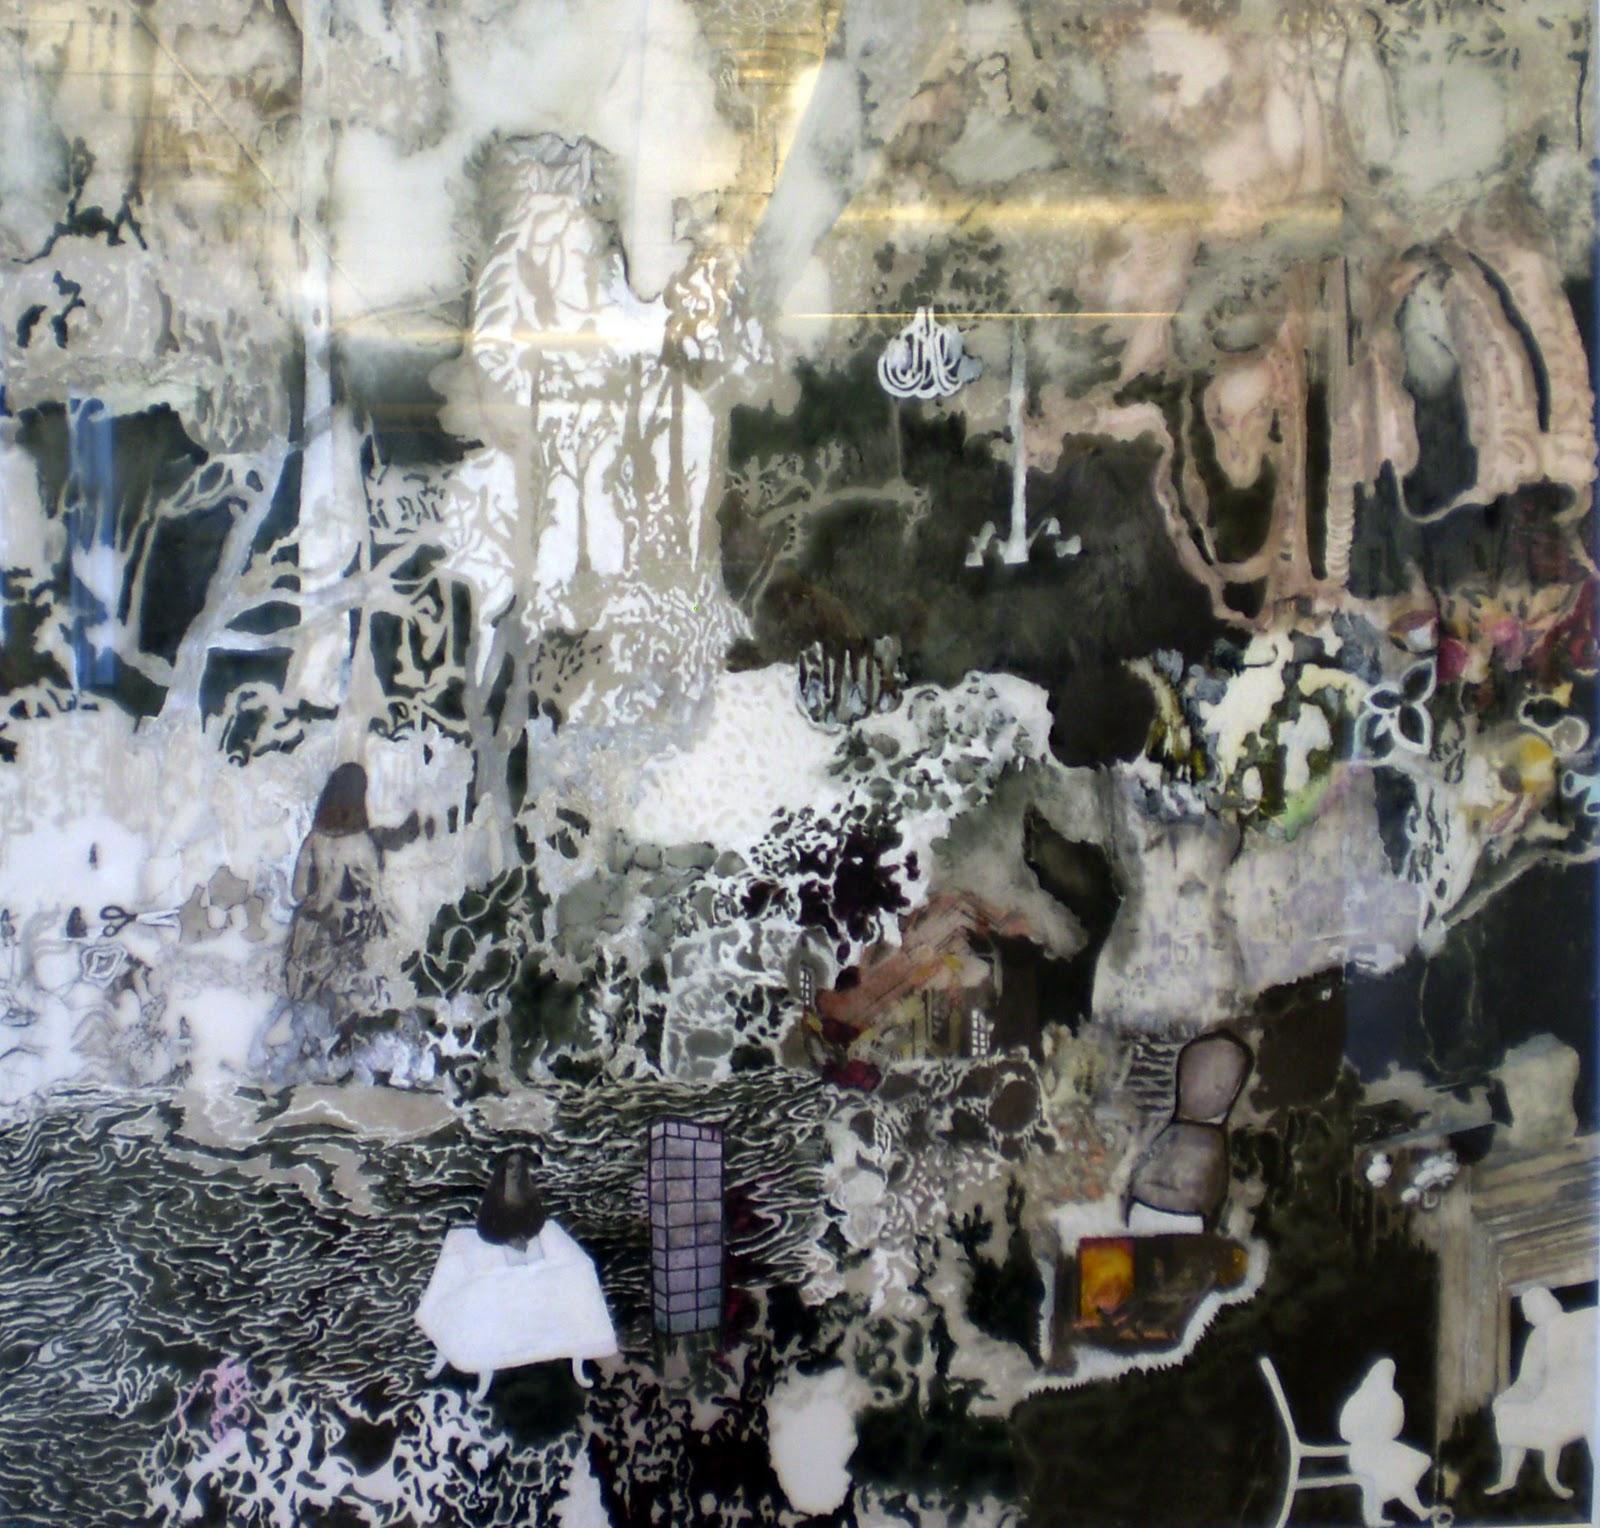 Wohndesign Tamara Petersen: Recent Exhibition